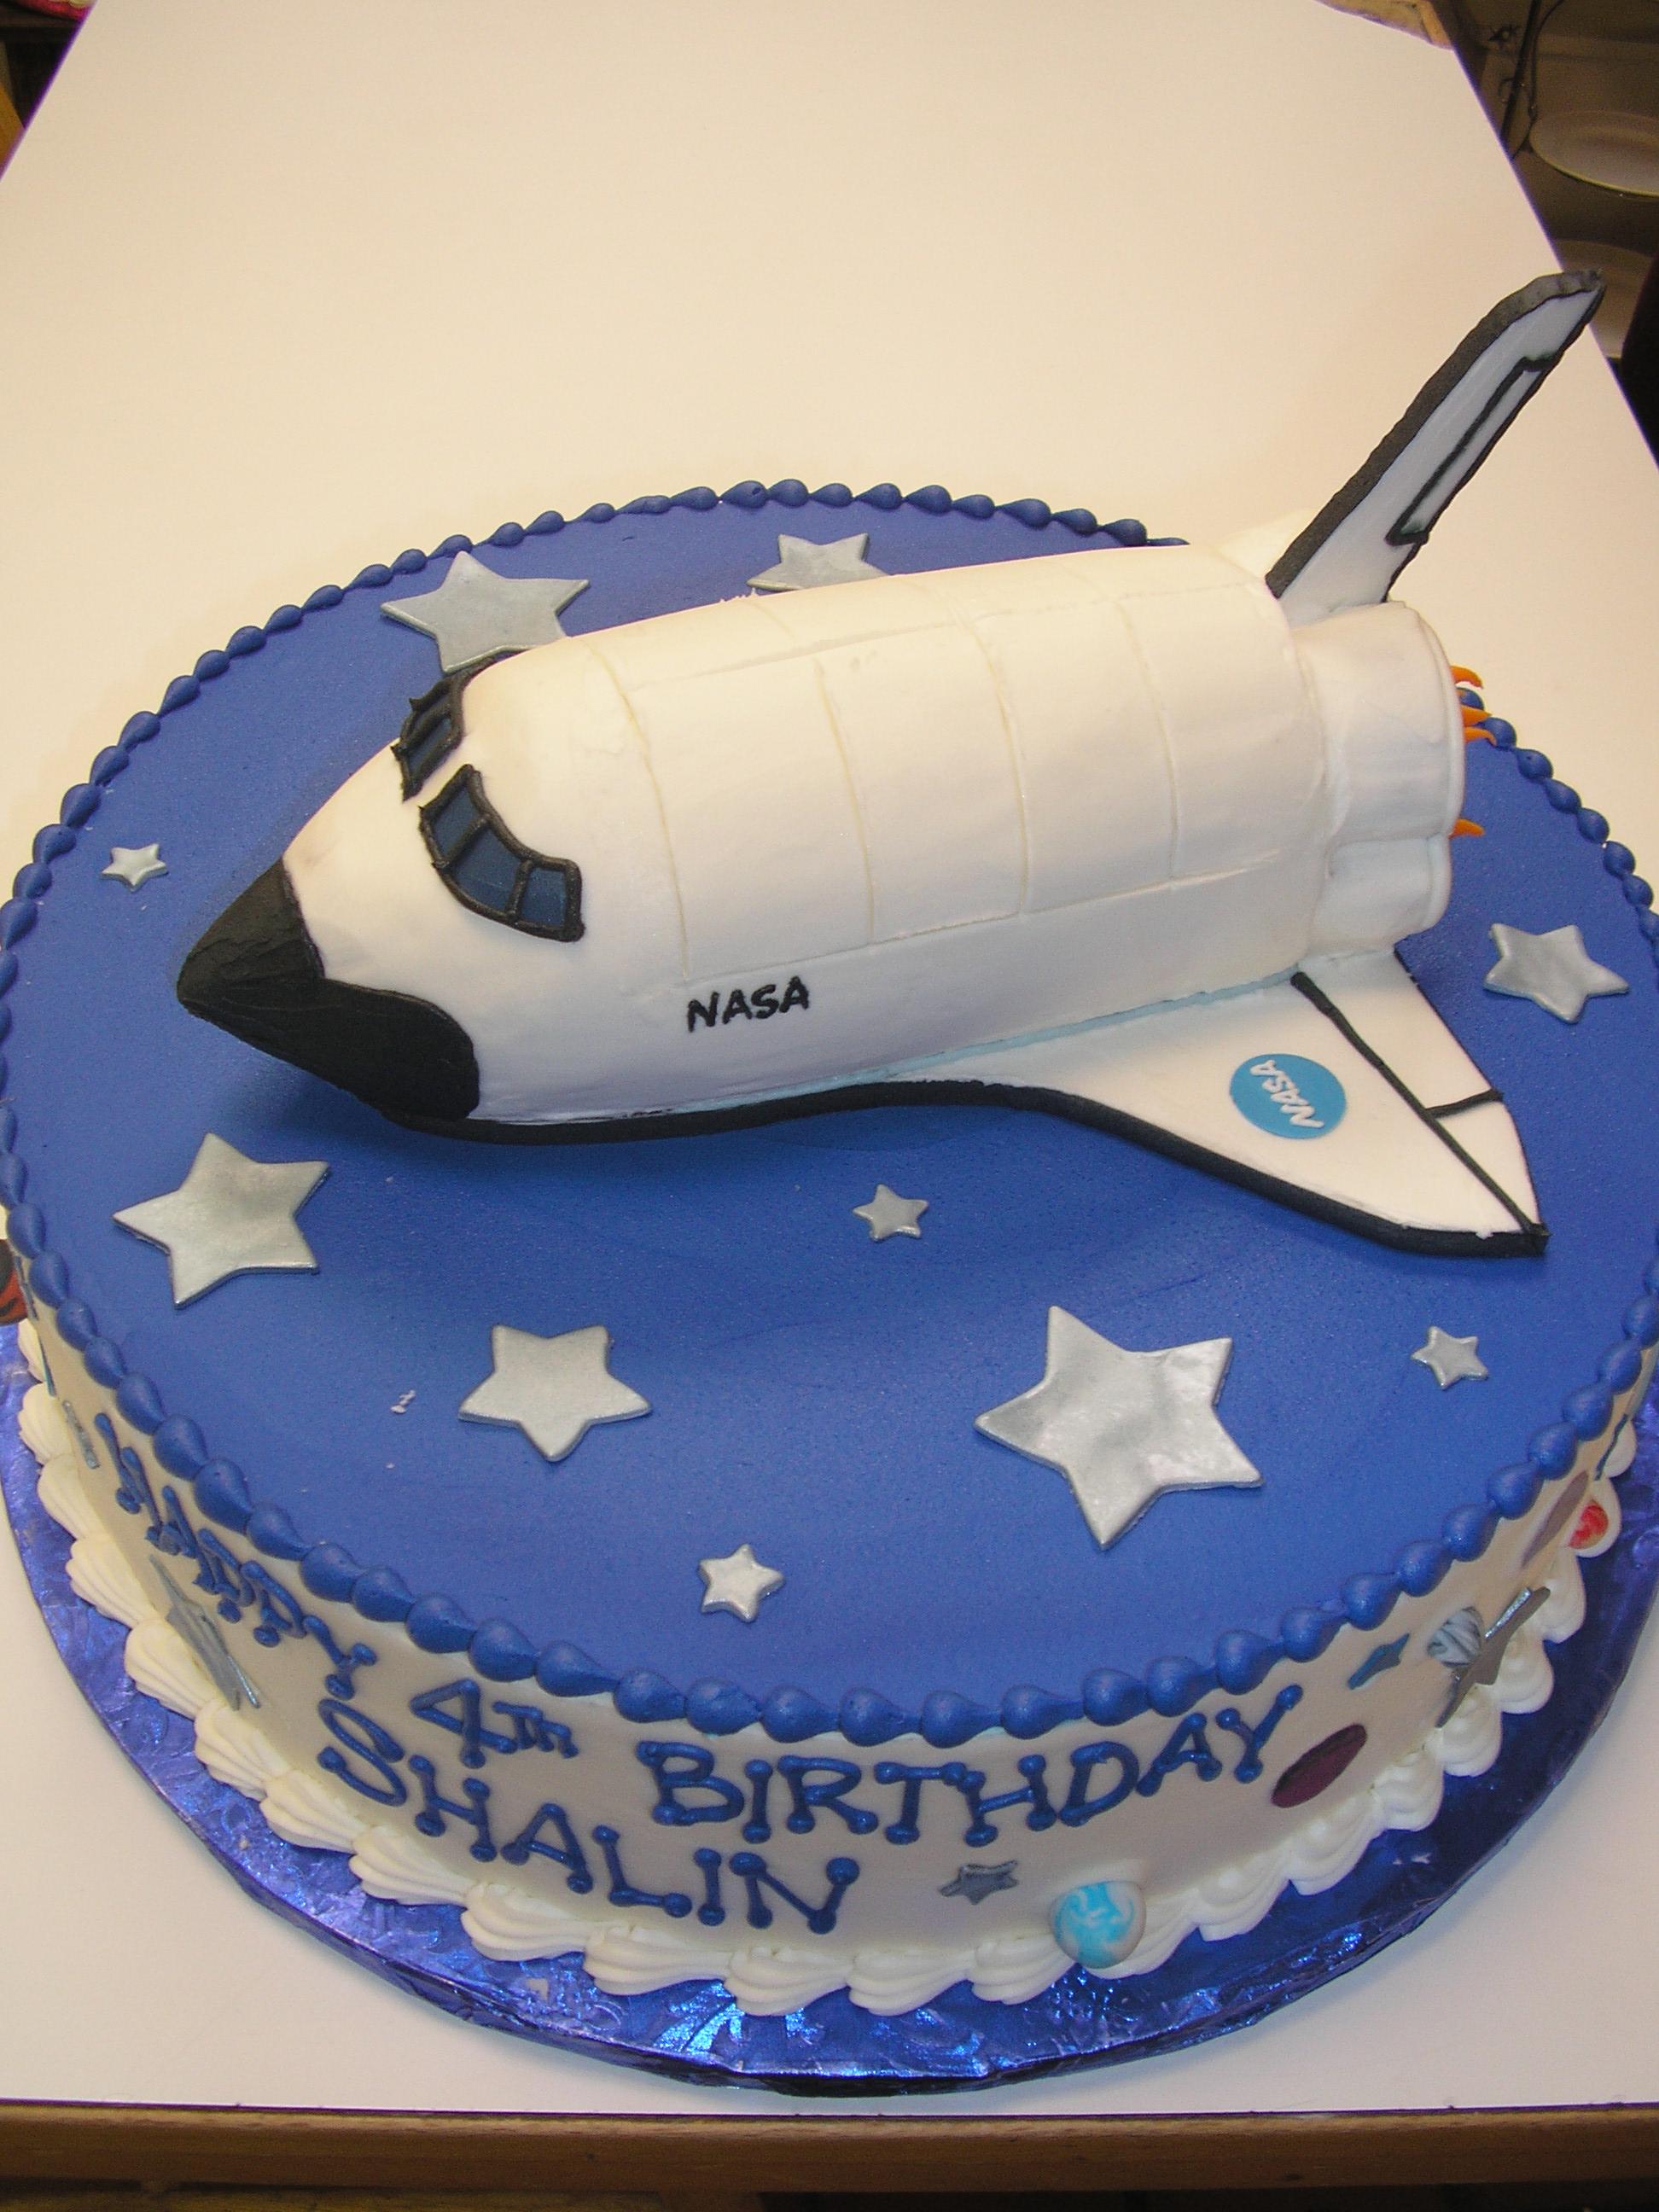 space shuttle cake, NASA cake, 3D space shuttle cake